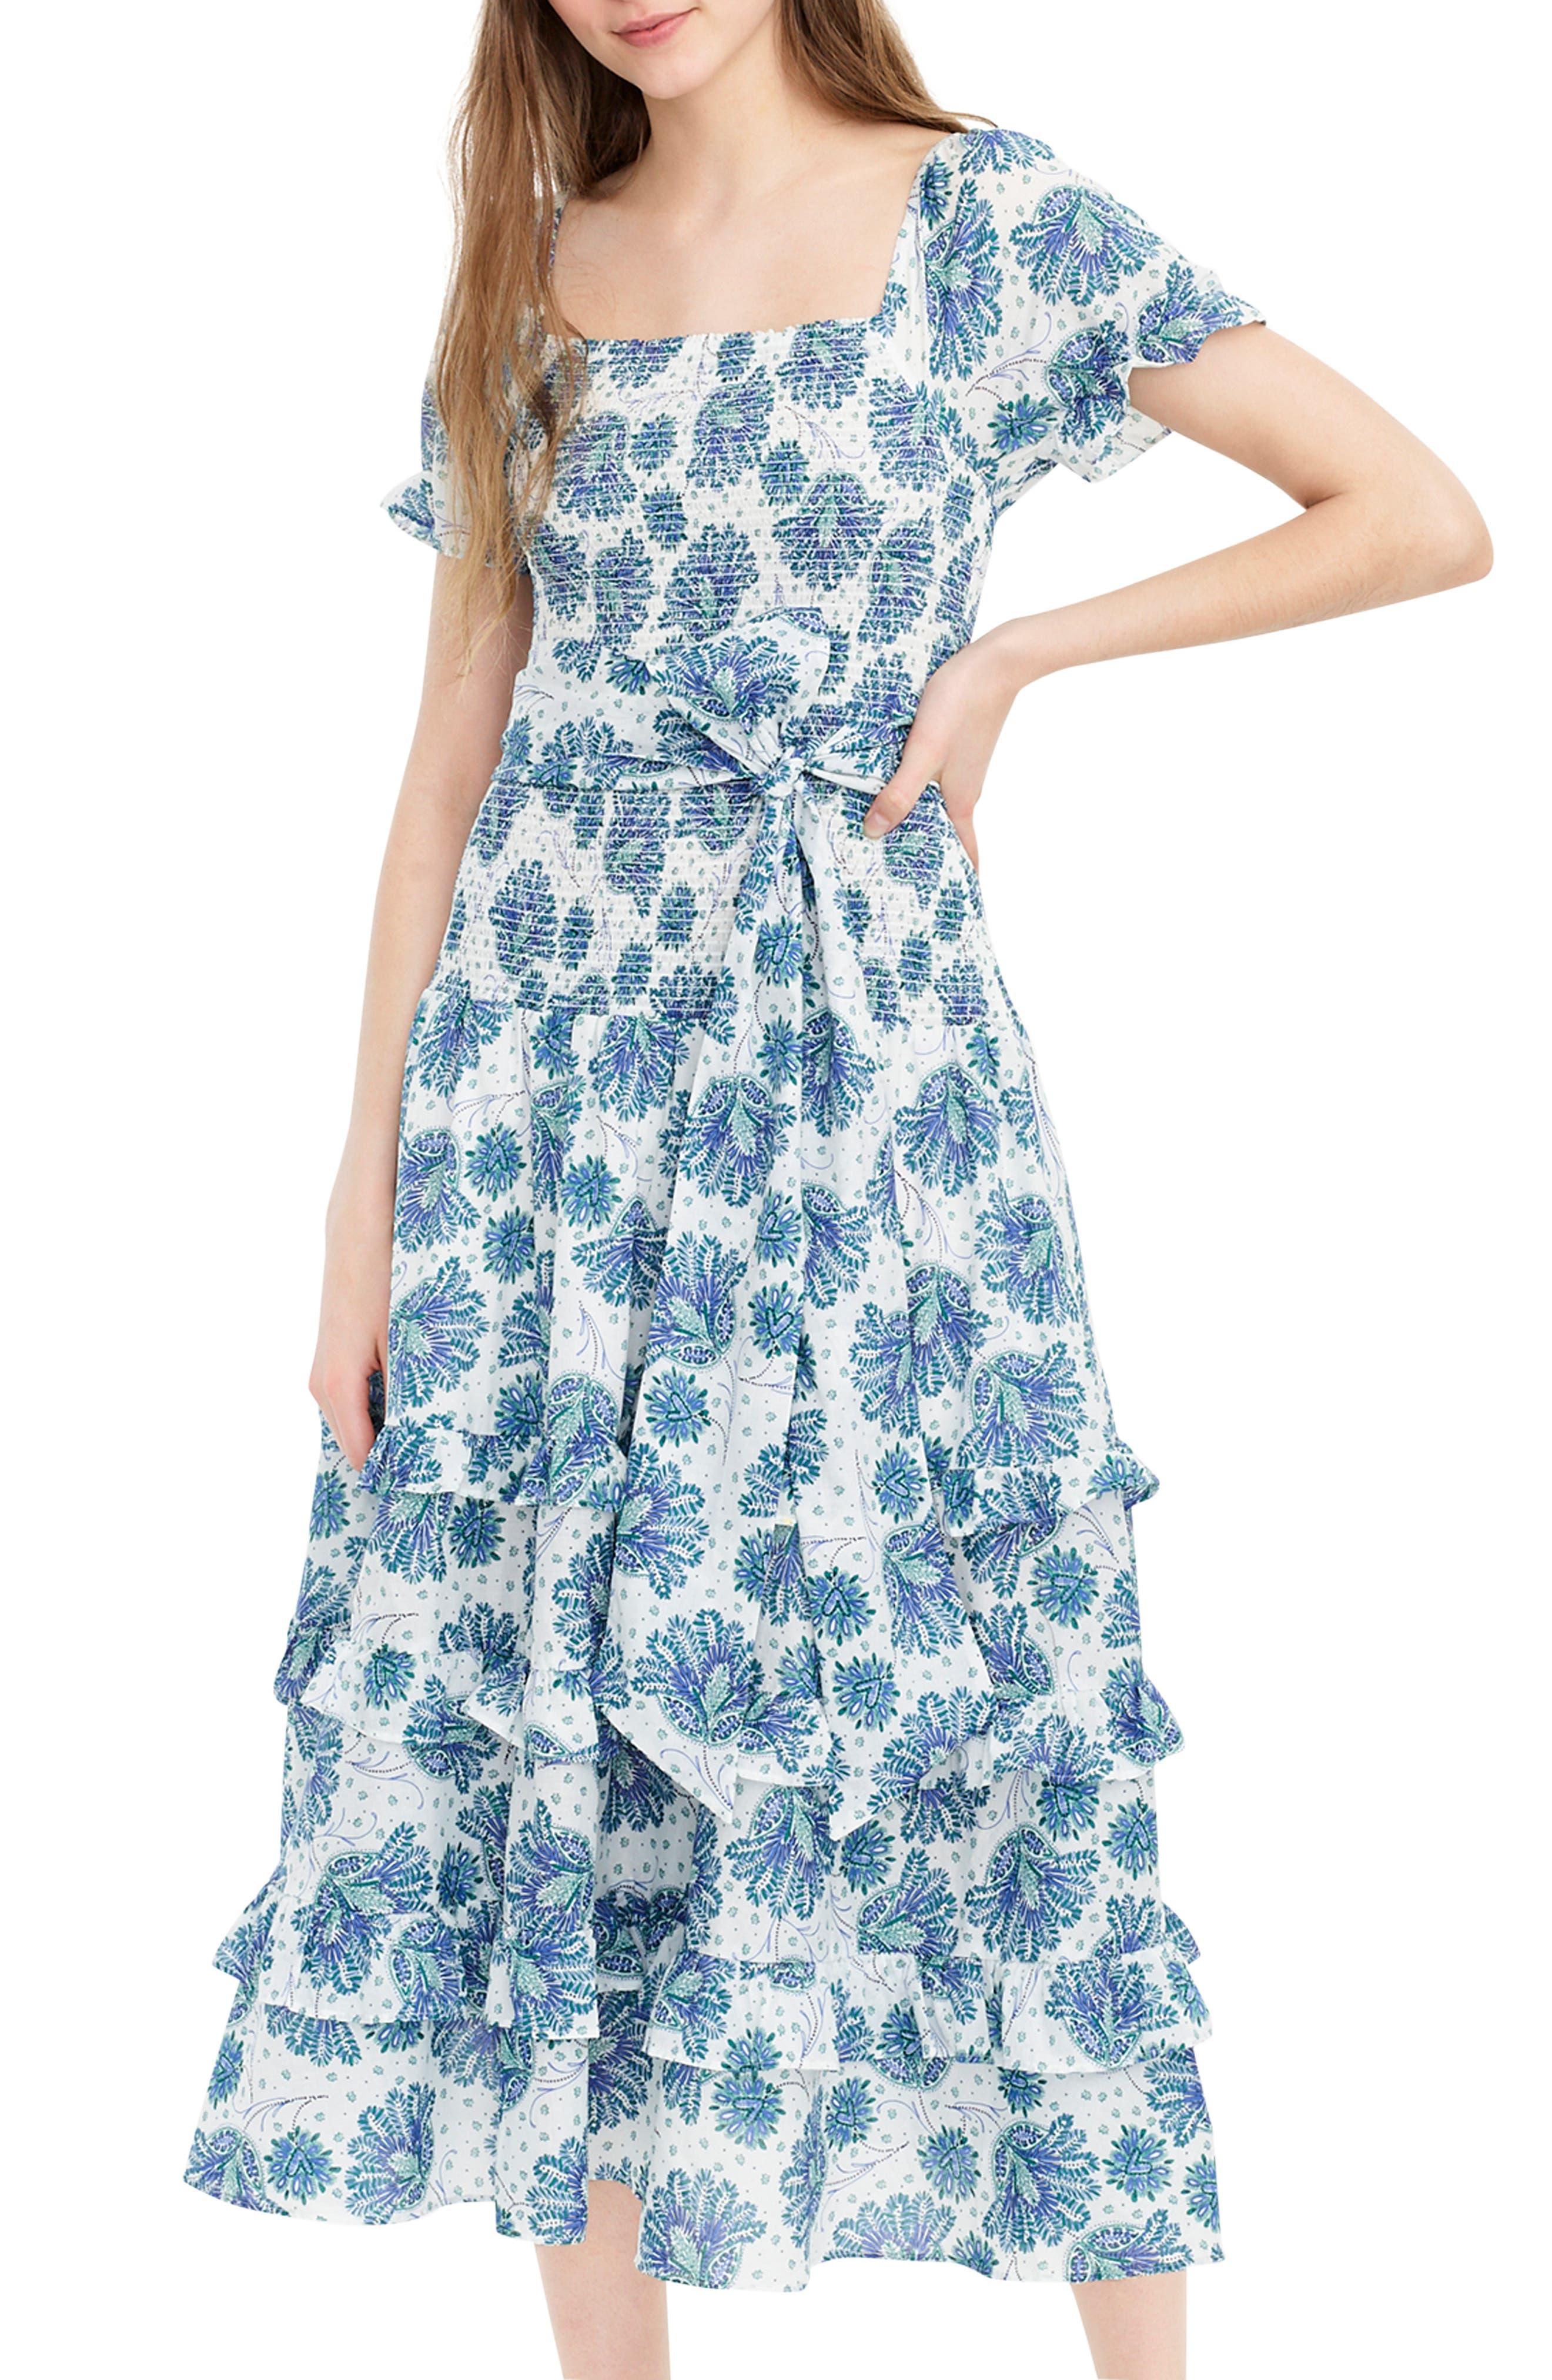 J.crew Smocked Prairie Midi Dress, Ivory